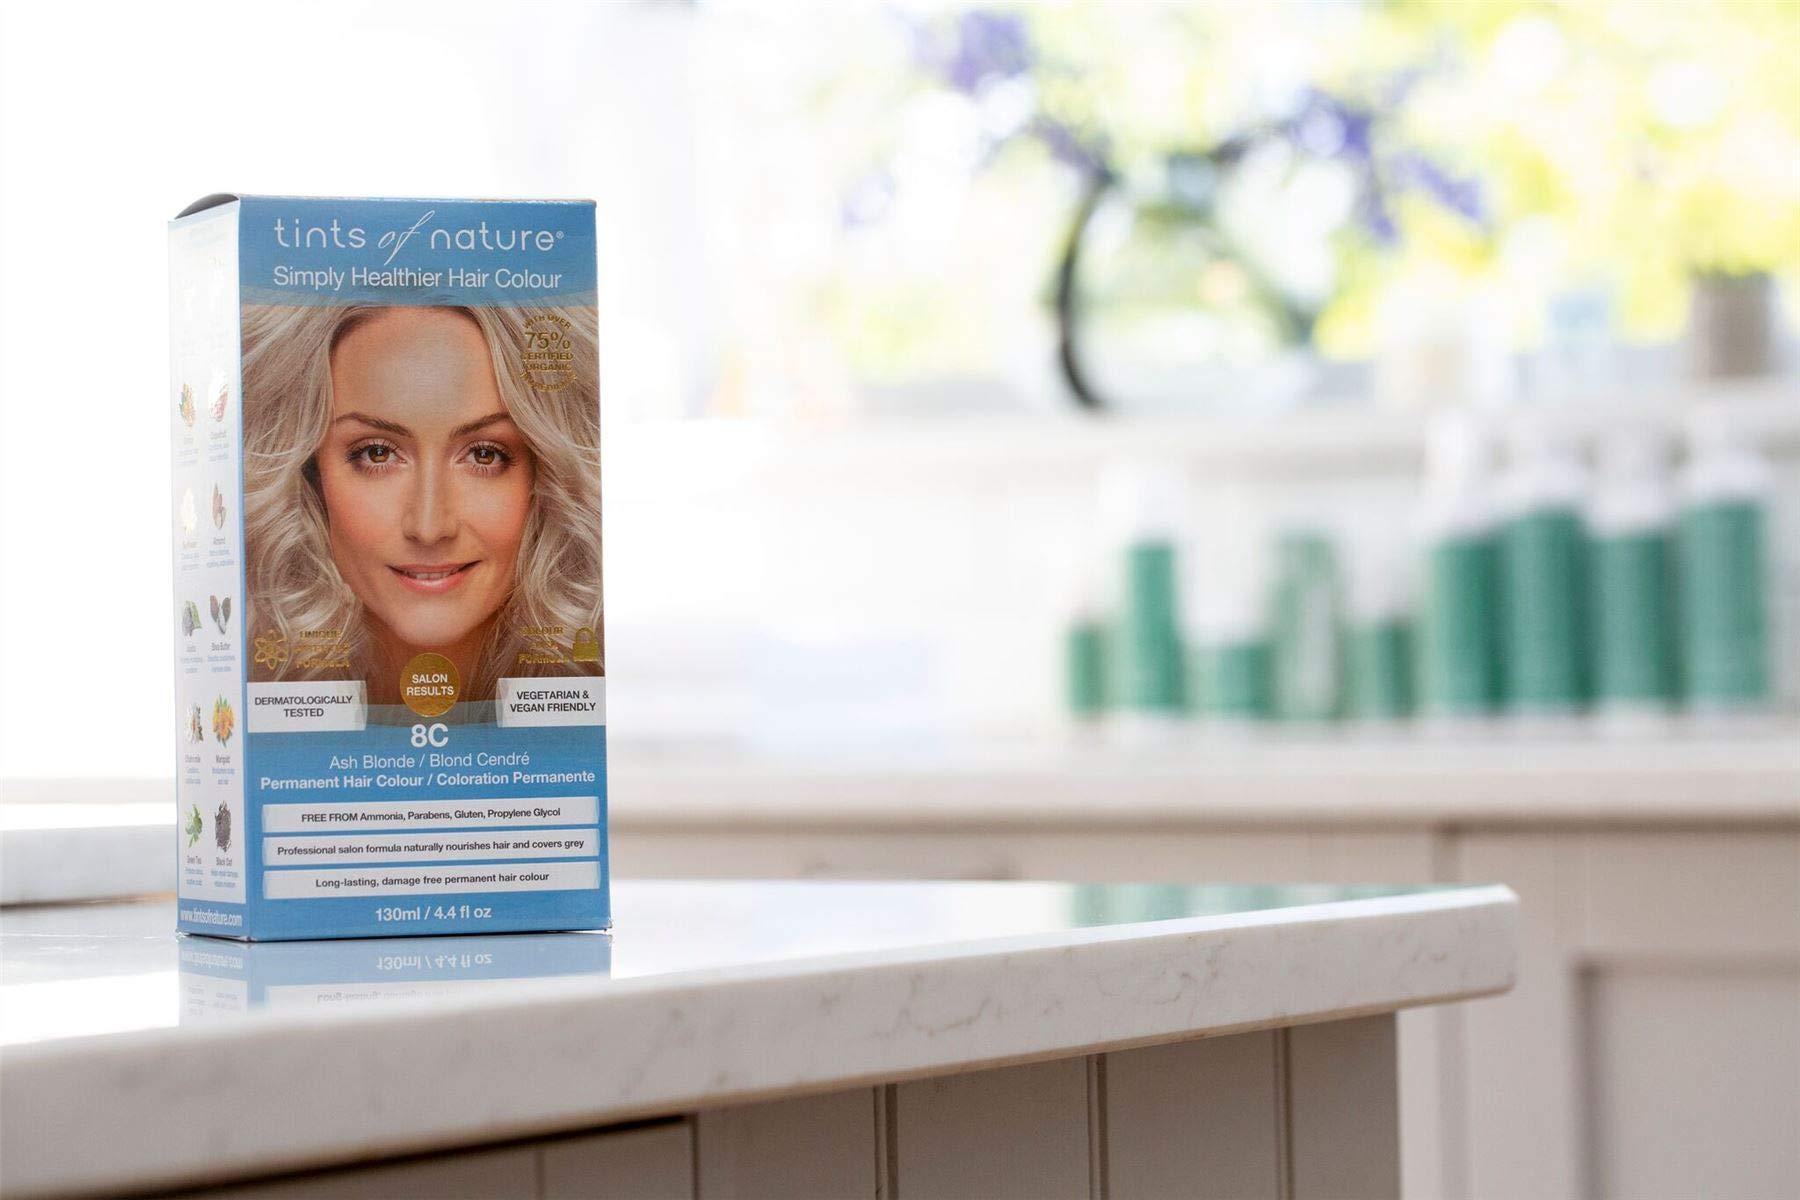 Tints of Nature 8C Ash Blonde Permanent Hair Dye | A Naturally Cool Icy Blonde Home Hair Colour Kit | Vegan Friendly | 130ml / 4.4 fl oz